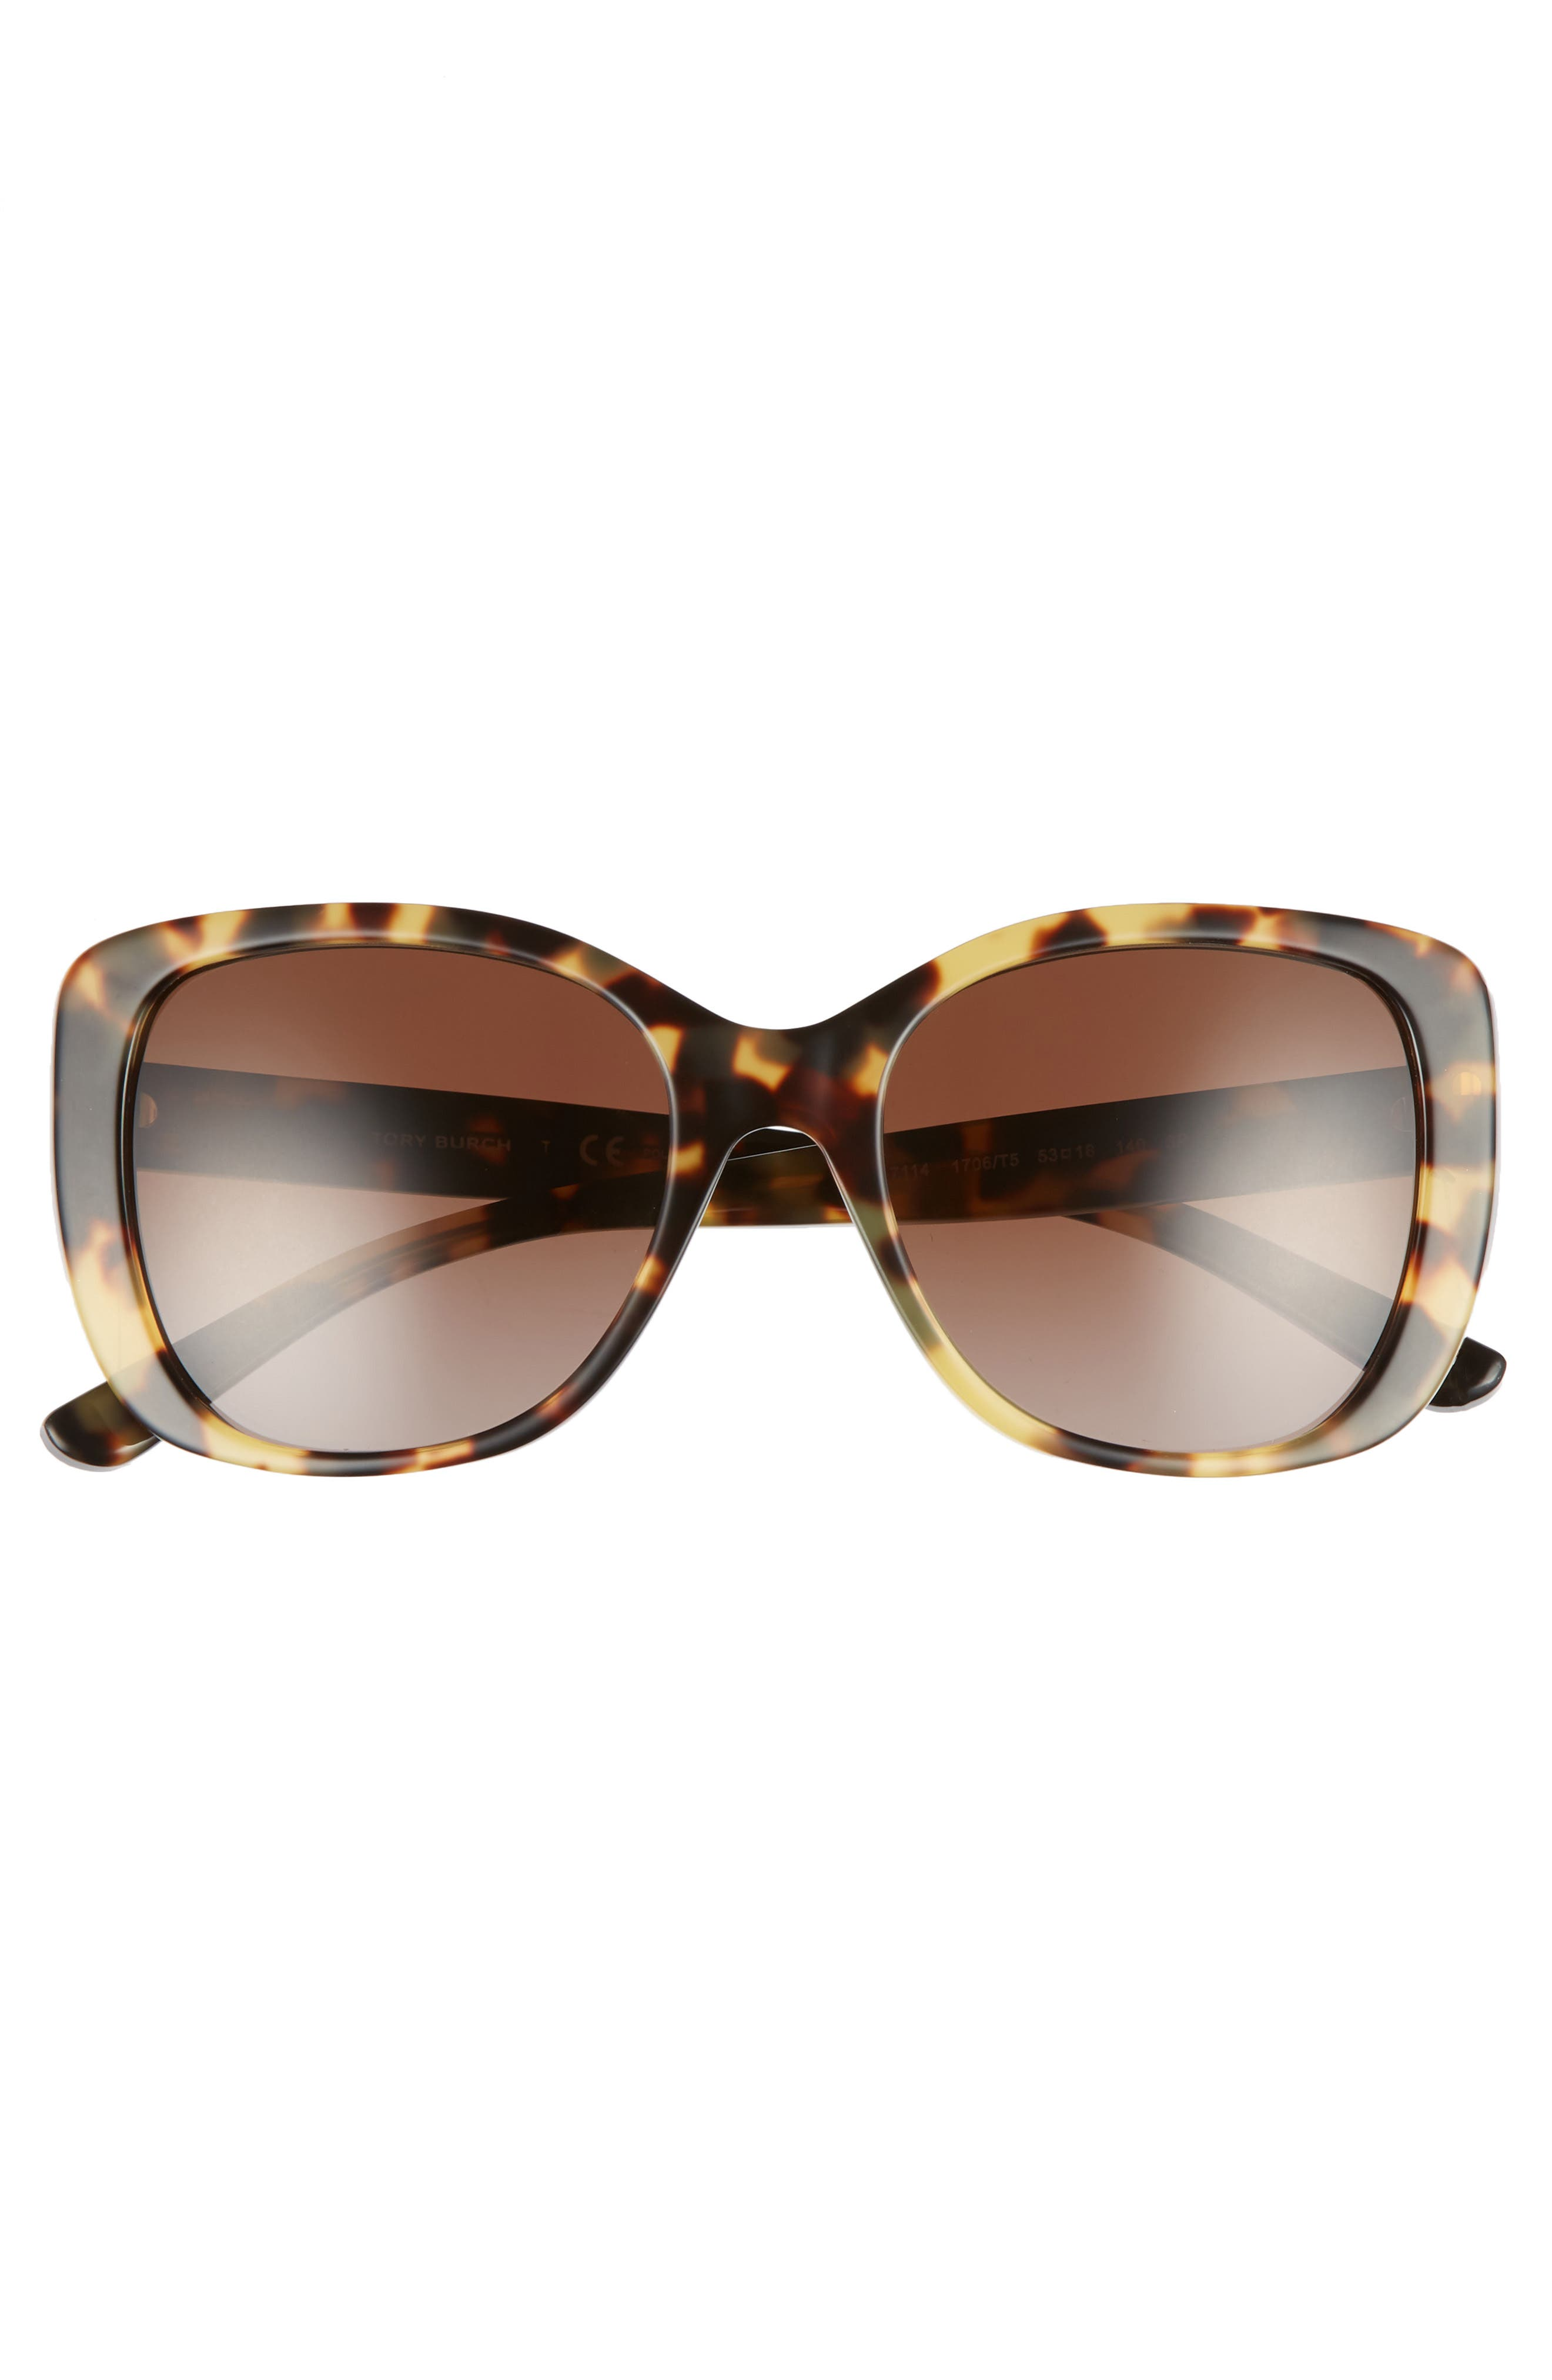 53mm Polarized Rectangle Sunglasses,                             Alternate thumbnail 3, color,                             Tokyo Tortoise Gradient